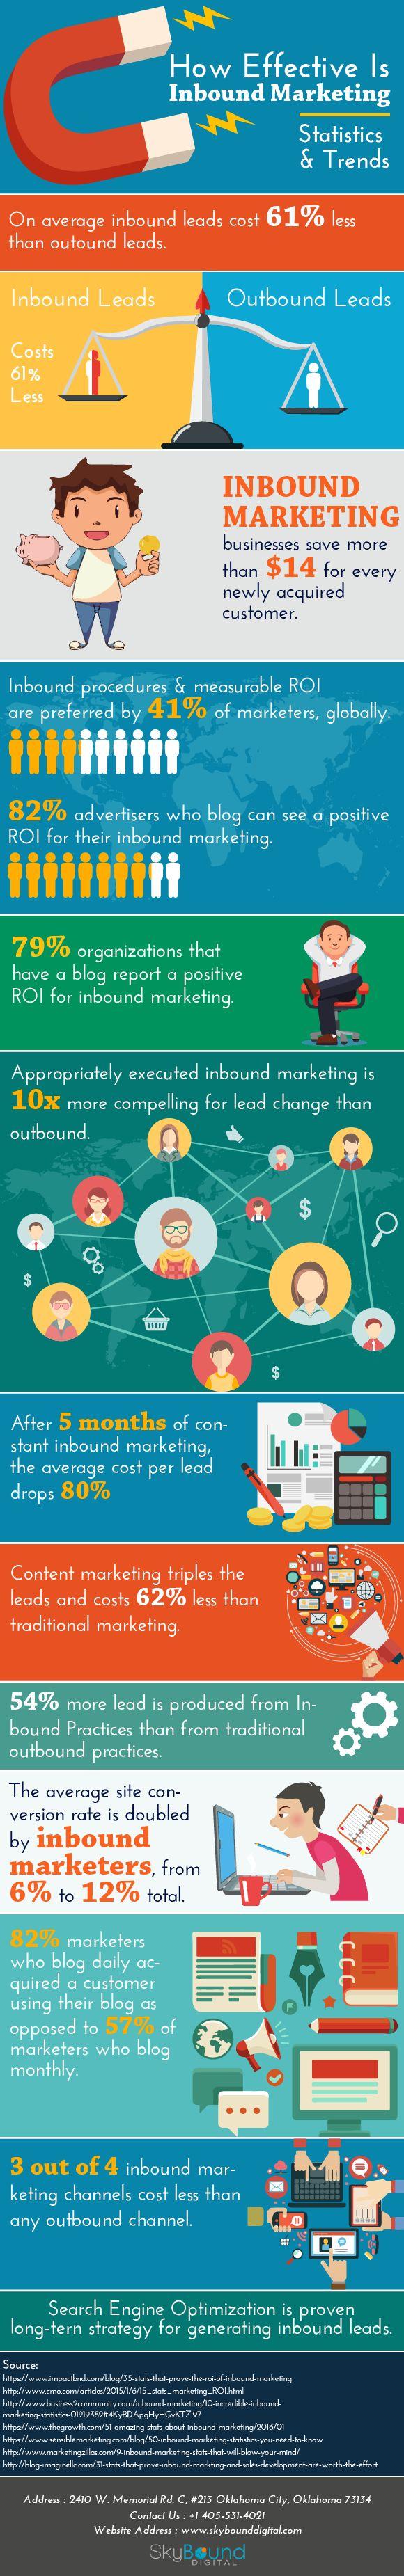 3 How Effective Is Inbound Marketing #infographic http://bit.ly/2mvUxoF